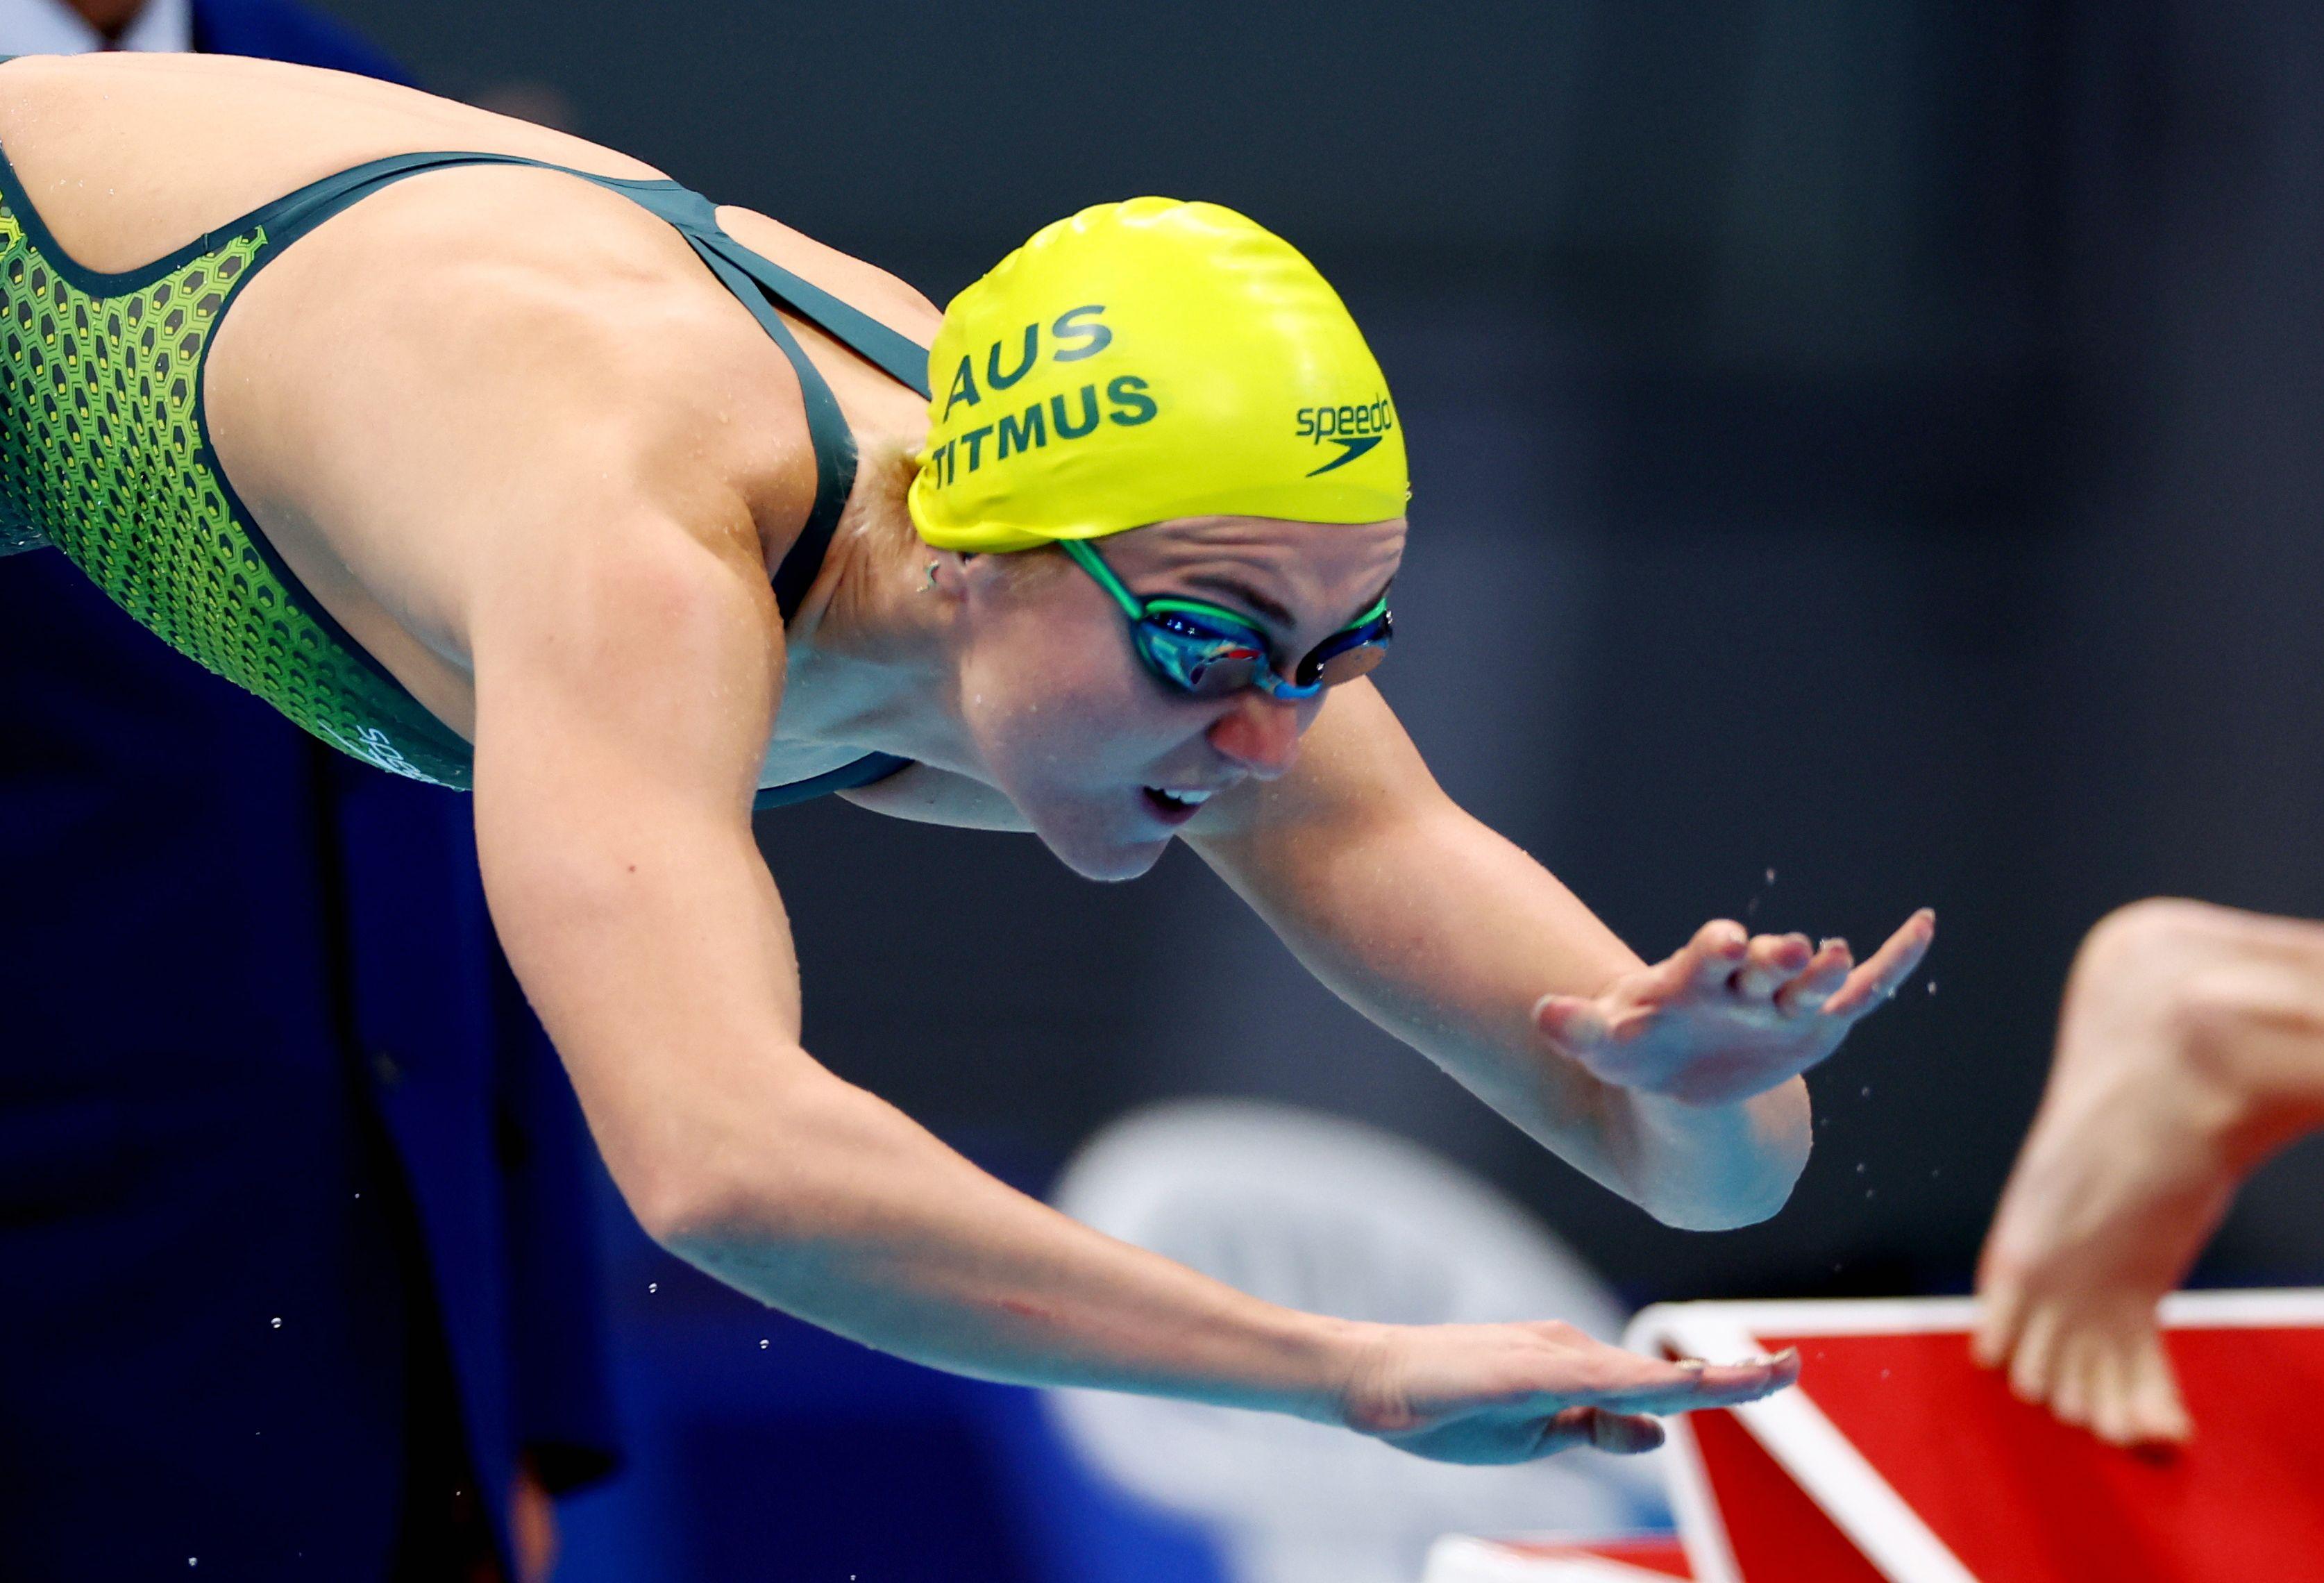 Tokyo 2020 Olympics - Swimming - Women's 200m Freestyle - Final - Tokyo Aquatics Centre - Tokyo, Japan - July 28, 2021. Ariarne Titmus of Australia  in action REUTERS/Kai Pfaffenbach